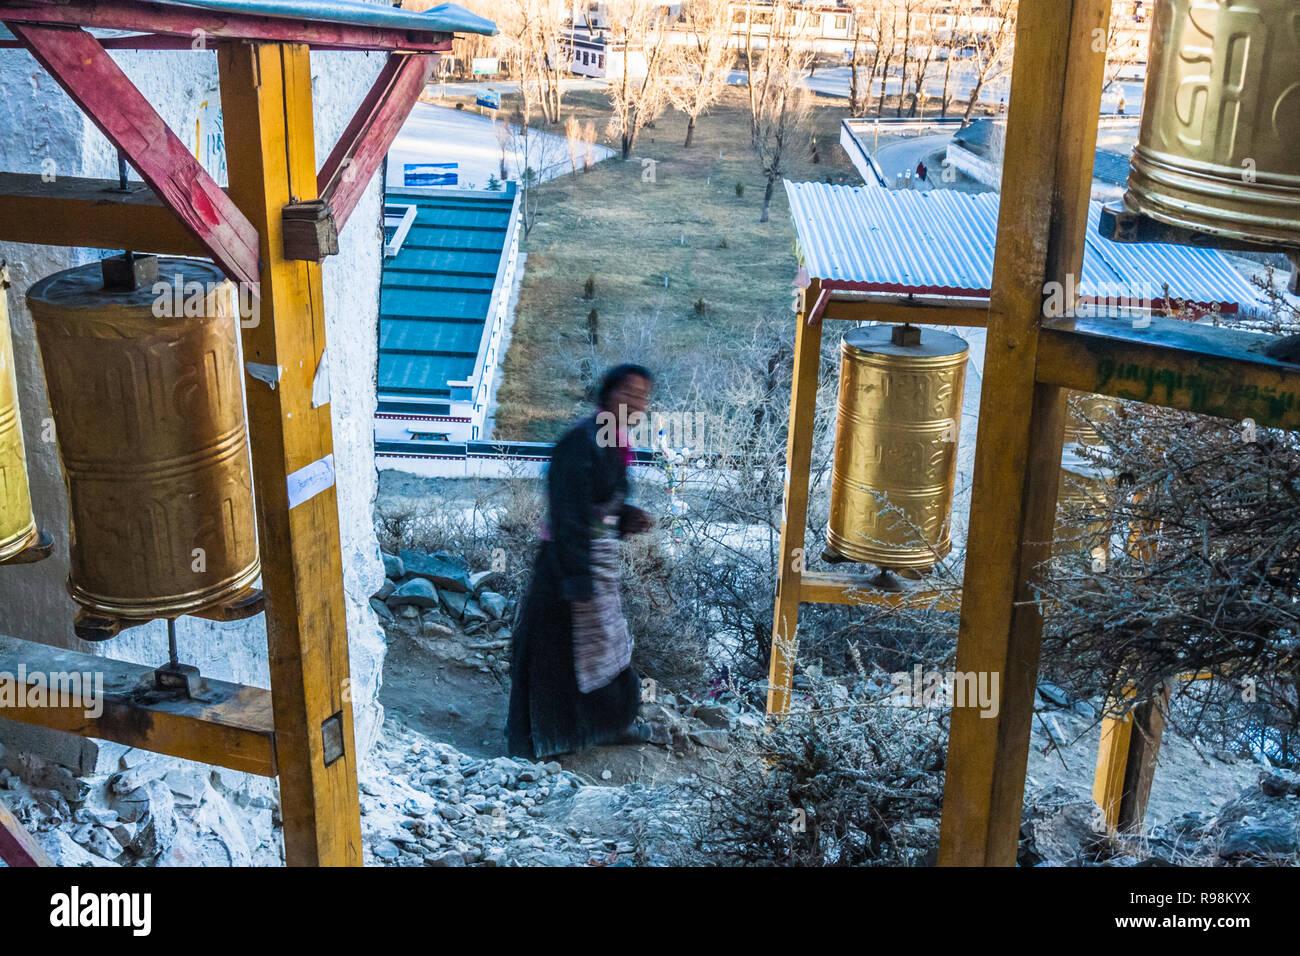 Shigatse, Tibet Autonomous Region, China : A Buddhist pilgrim walks past prayer wheels on the lingkhor (sacred path)circumambulating the walls of Tash - Stock Image